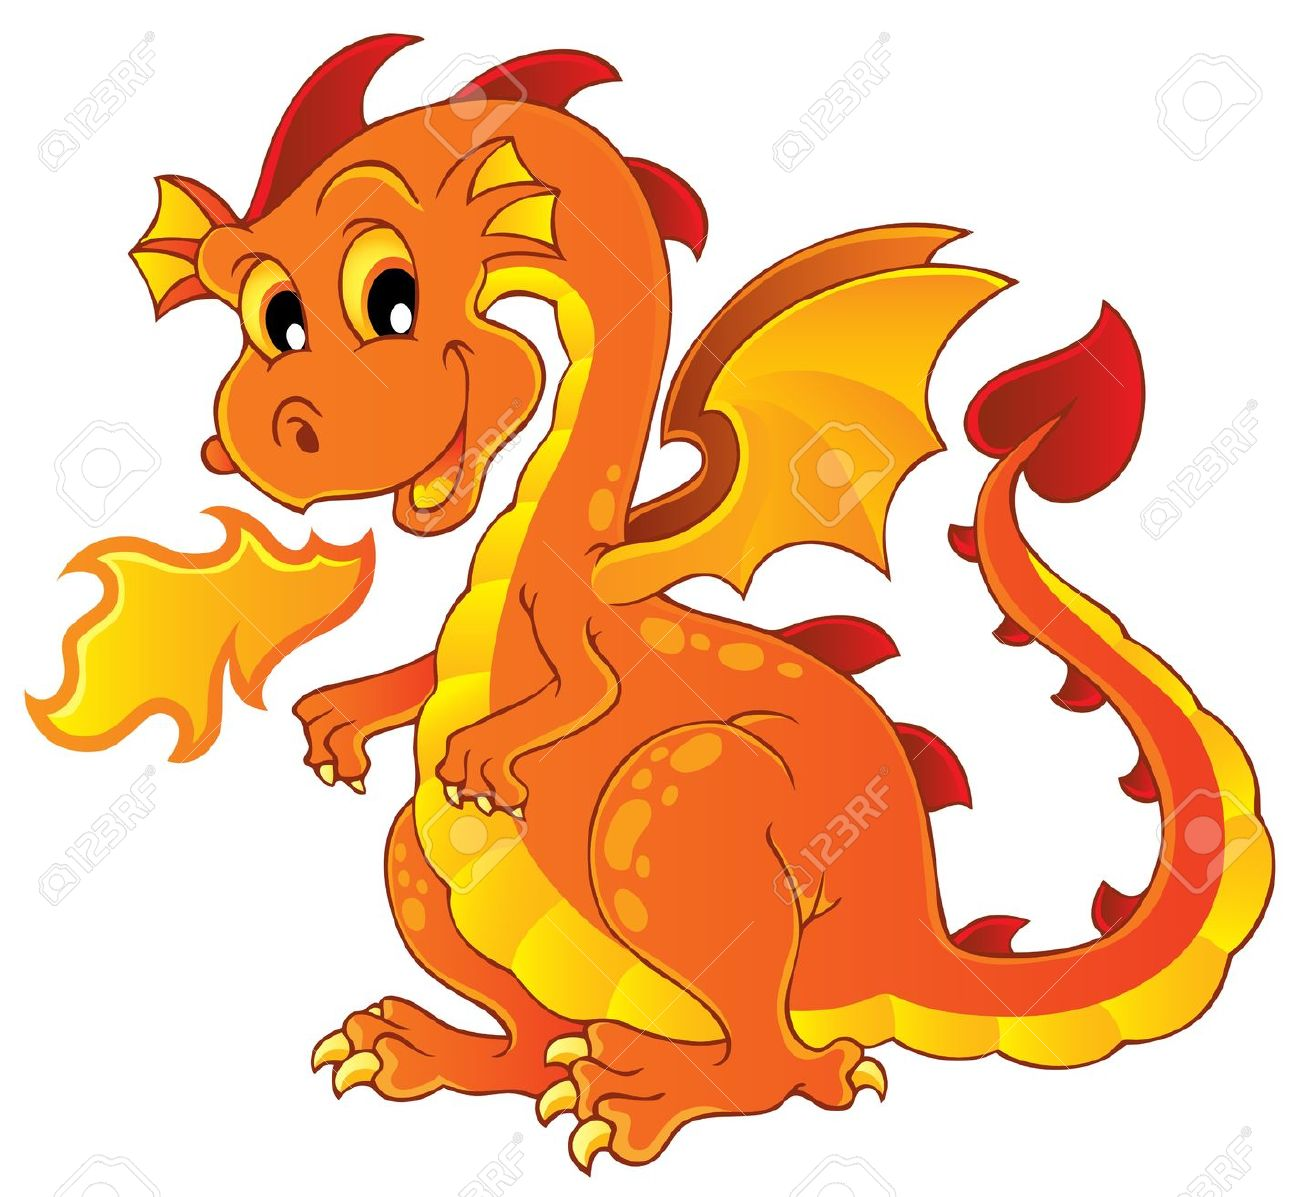 Dragon Clipart .